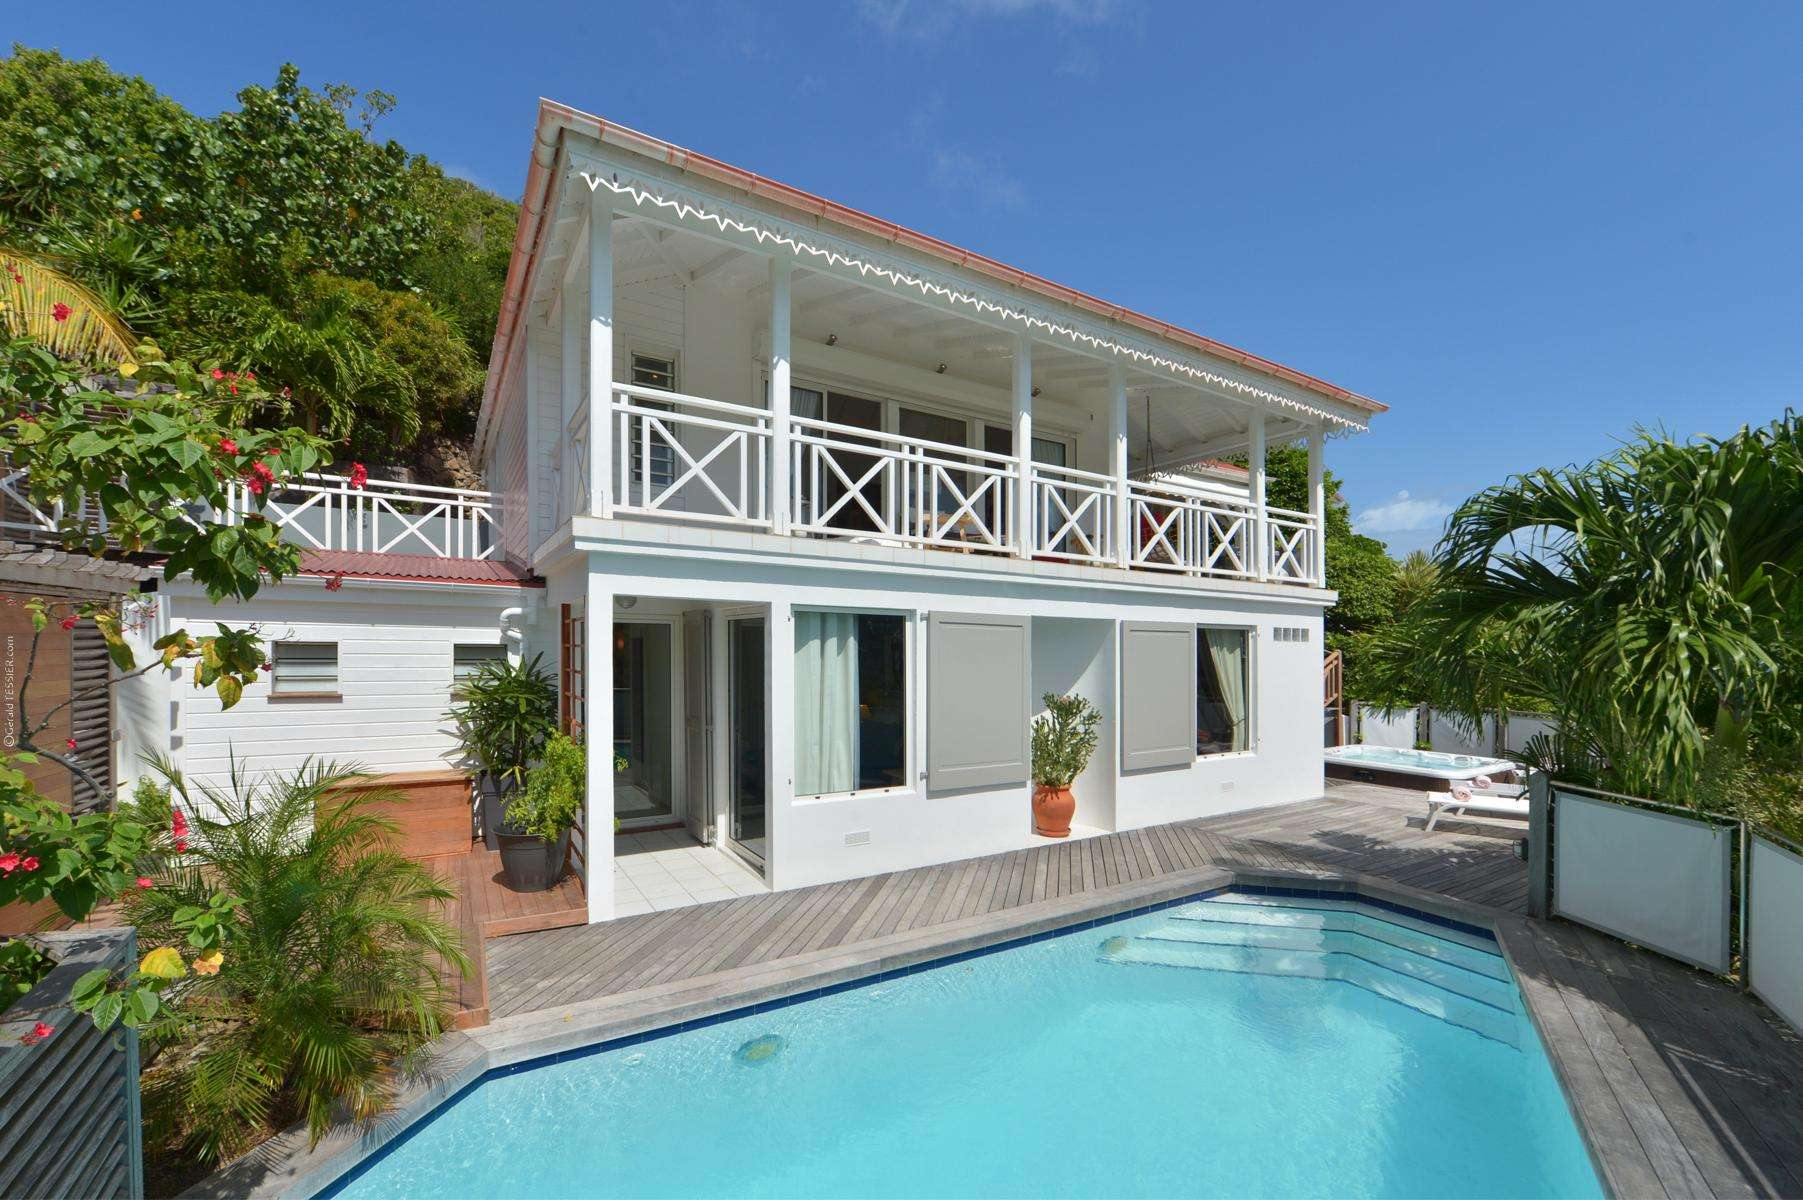 Luxury villa rentals caribbean - St barthelemy - Flamands - No location 4 - Ipanema - Image 1/20